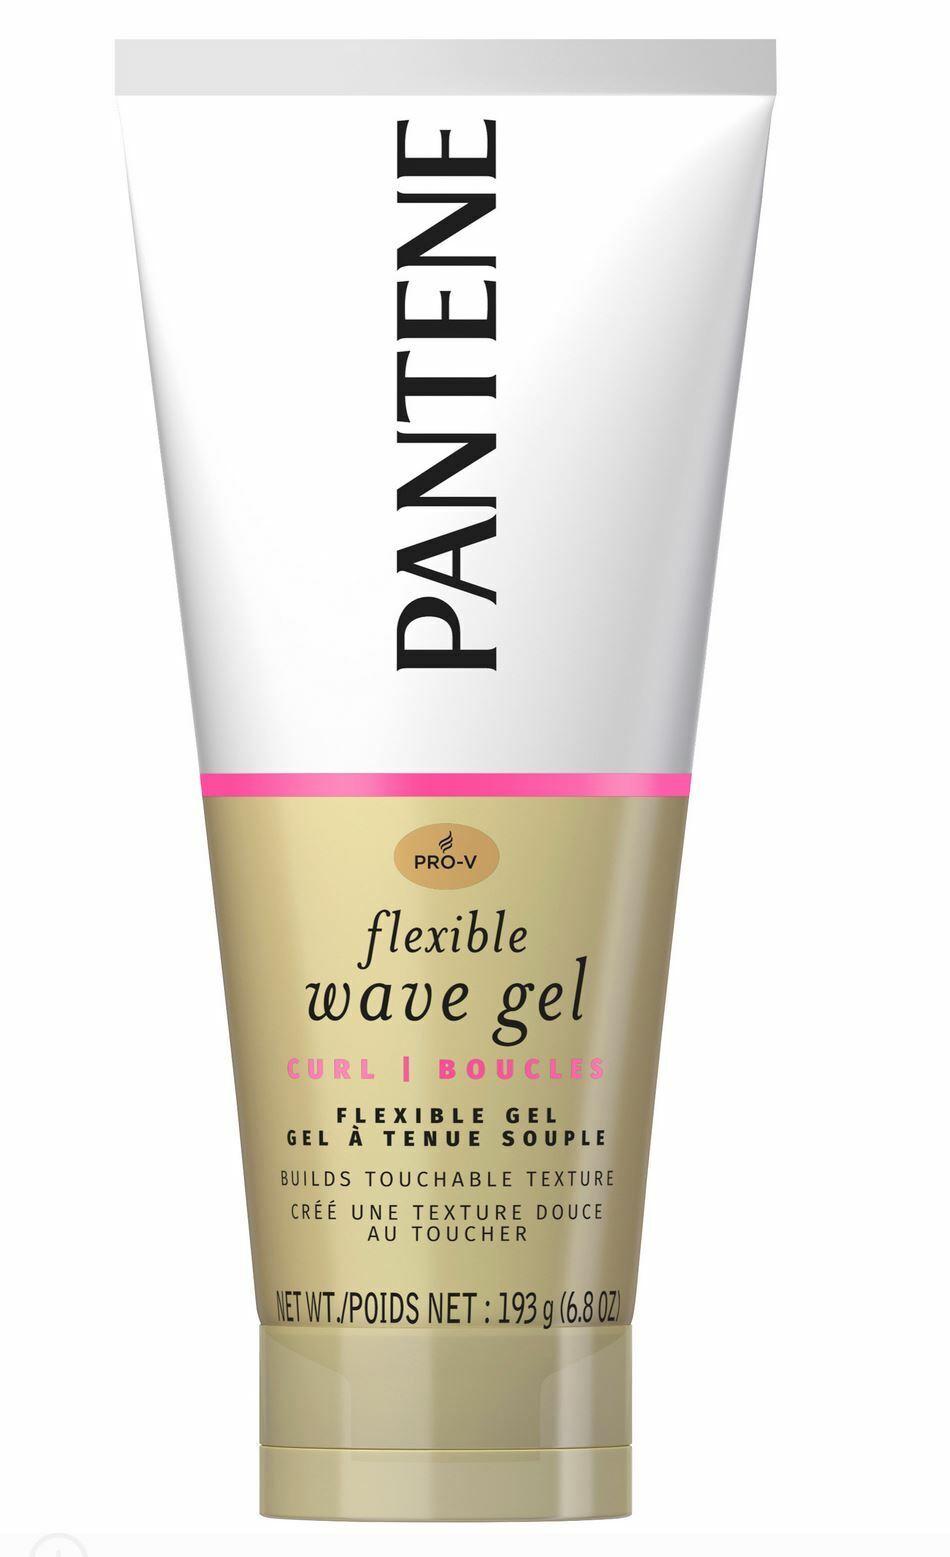 Pantene Pro-V Curly Hair Curl Shaping Hair Gel - 6.8 Oz, Pac